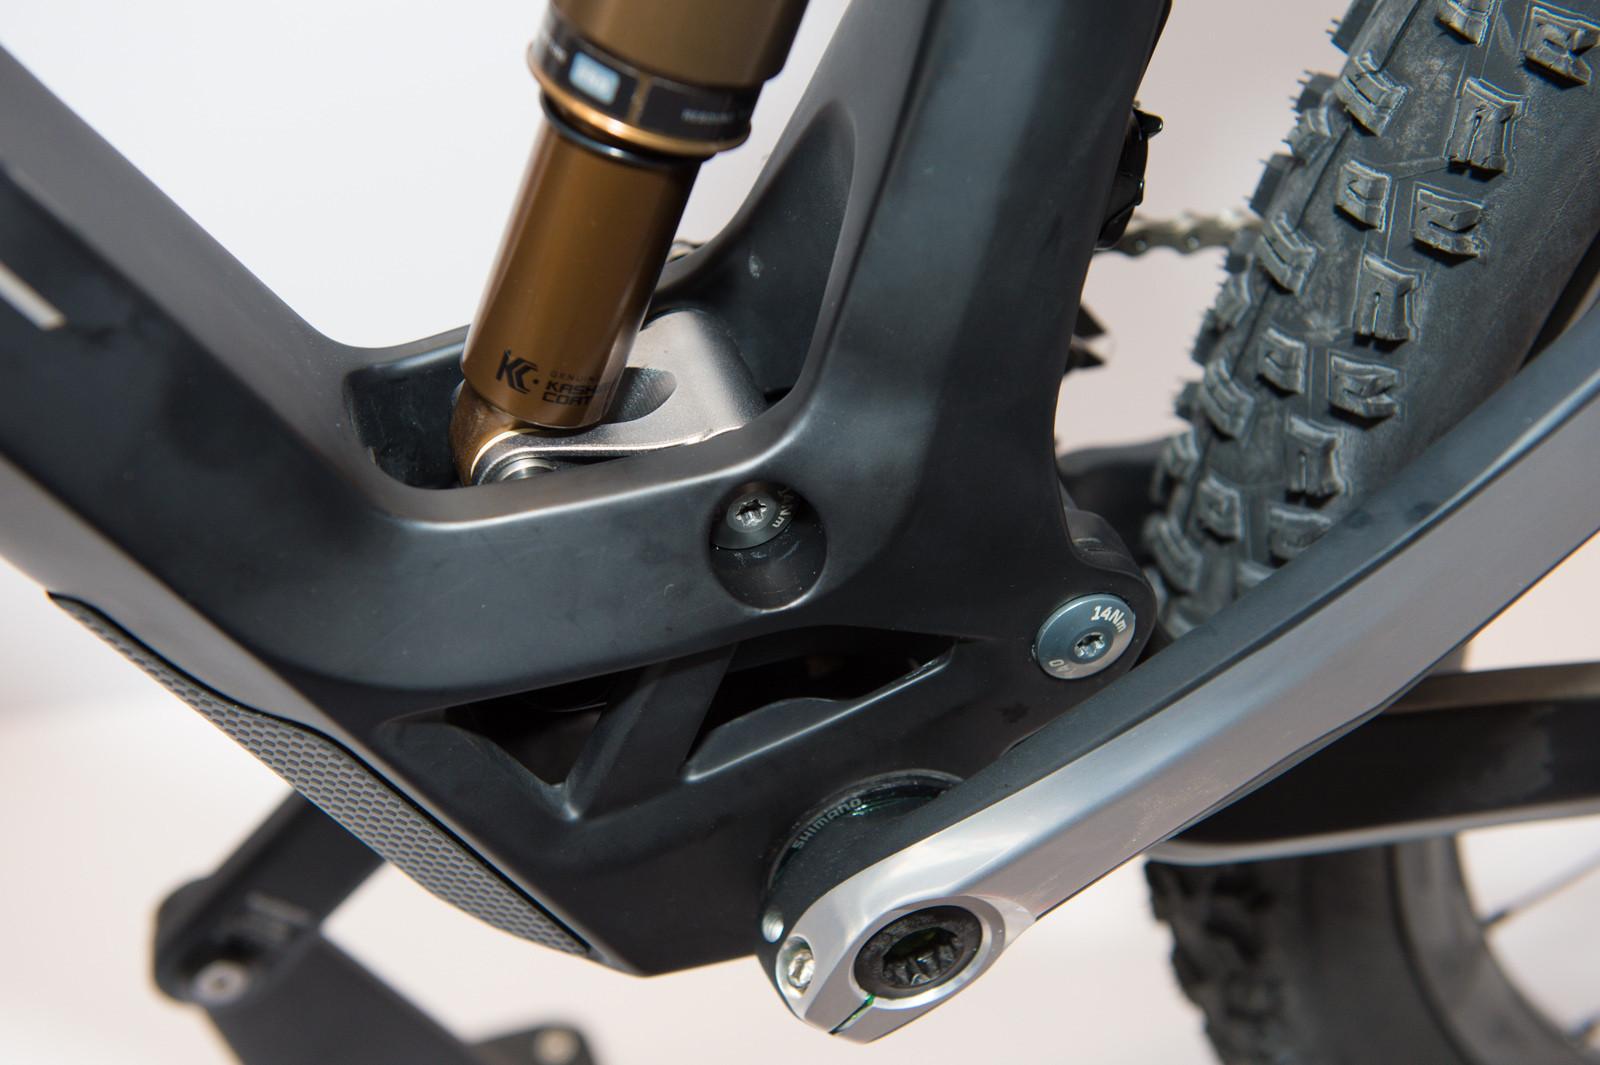 2014 Ghost Riot Suspension Close Up - 2014 Trail, All-Mountain & Enduro Bikes at Eurobike 2013 - Mountain Biking Pictures - Vital MTB